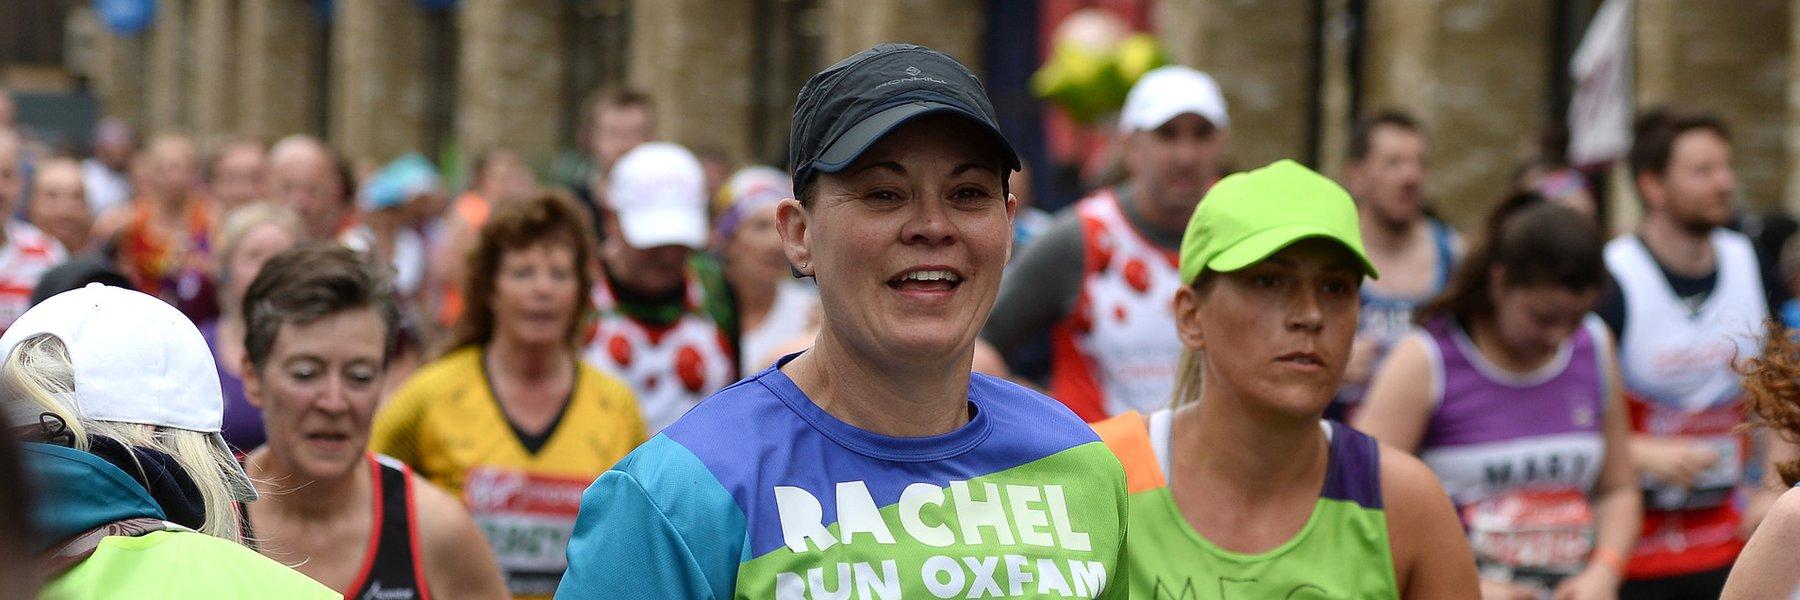 Rachel running for Oxfam during London Marathon 2019.